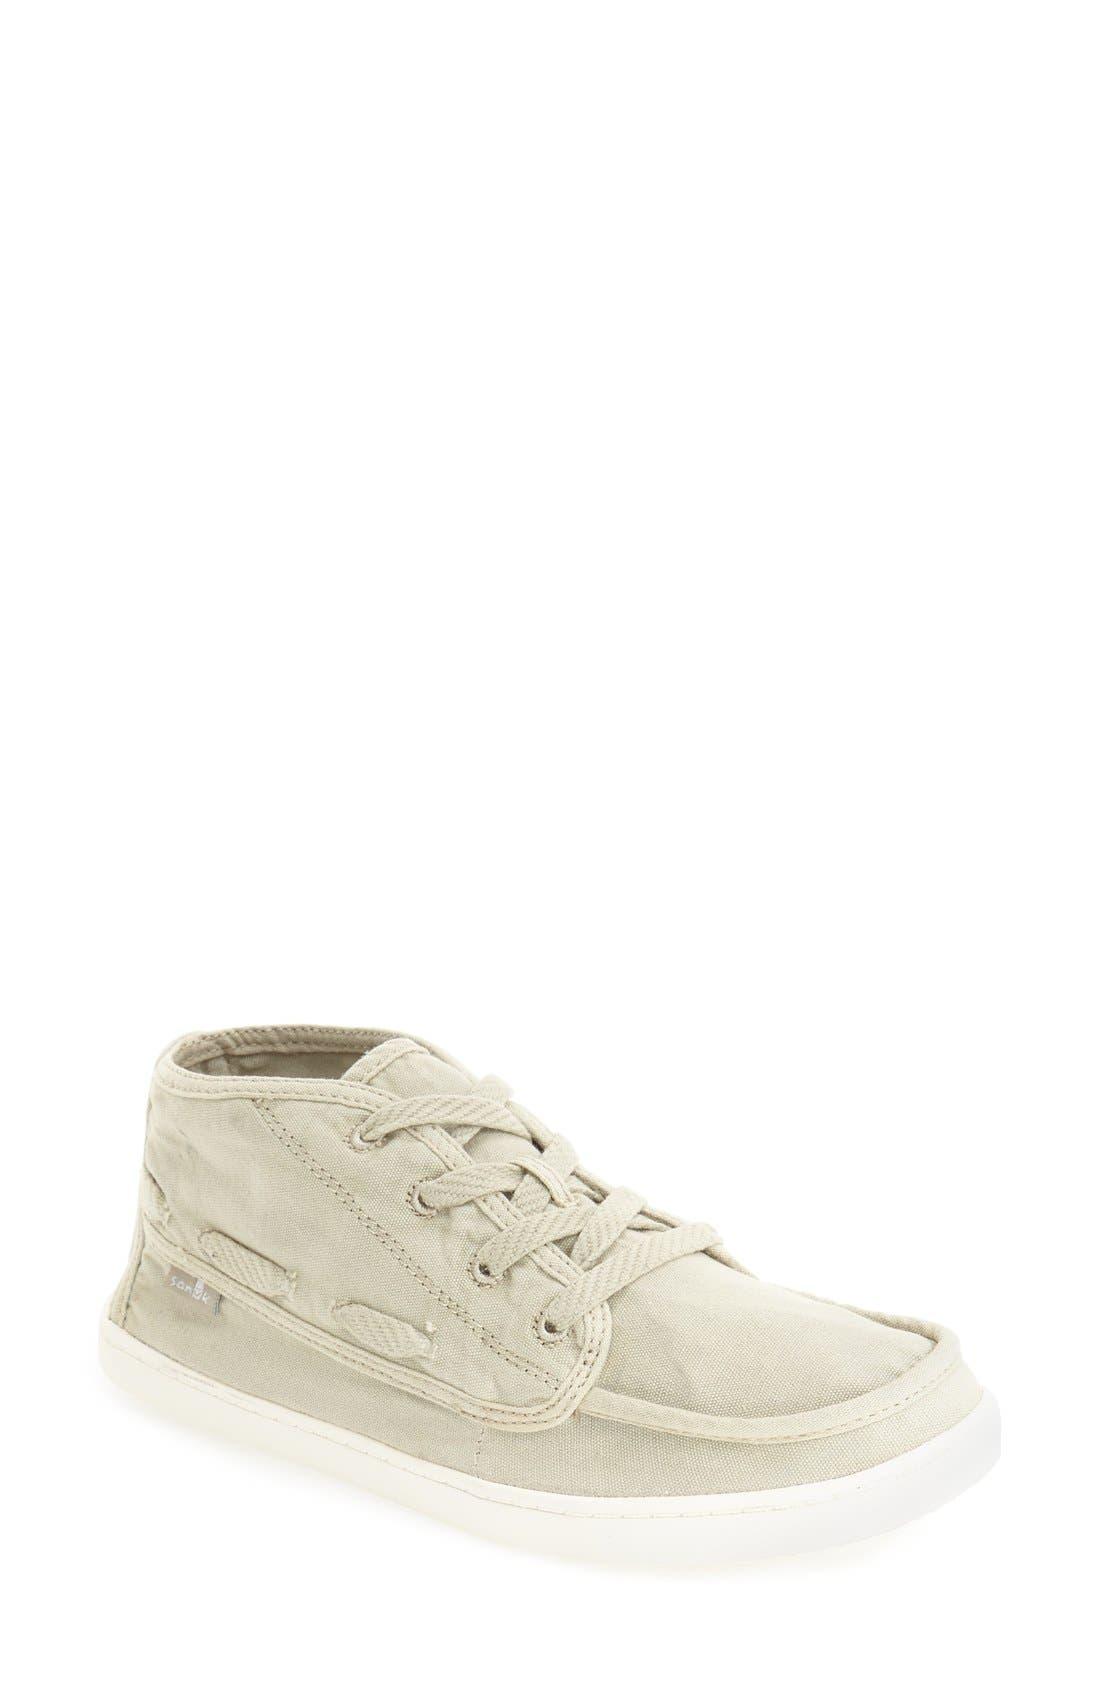 'Vee K Shawn' High Top Sneaker,                             Main thumbnail 2, color,